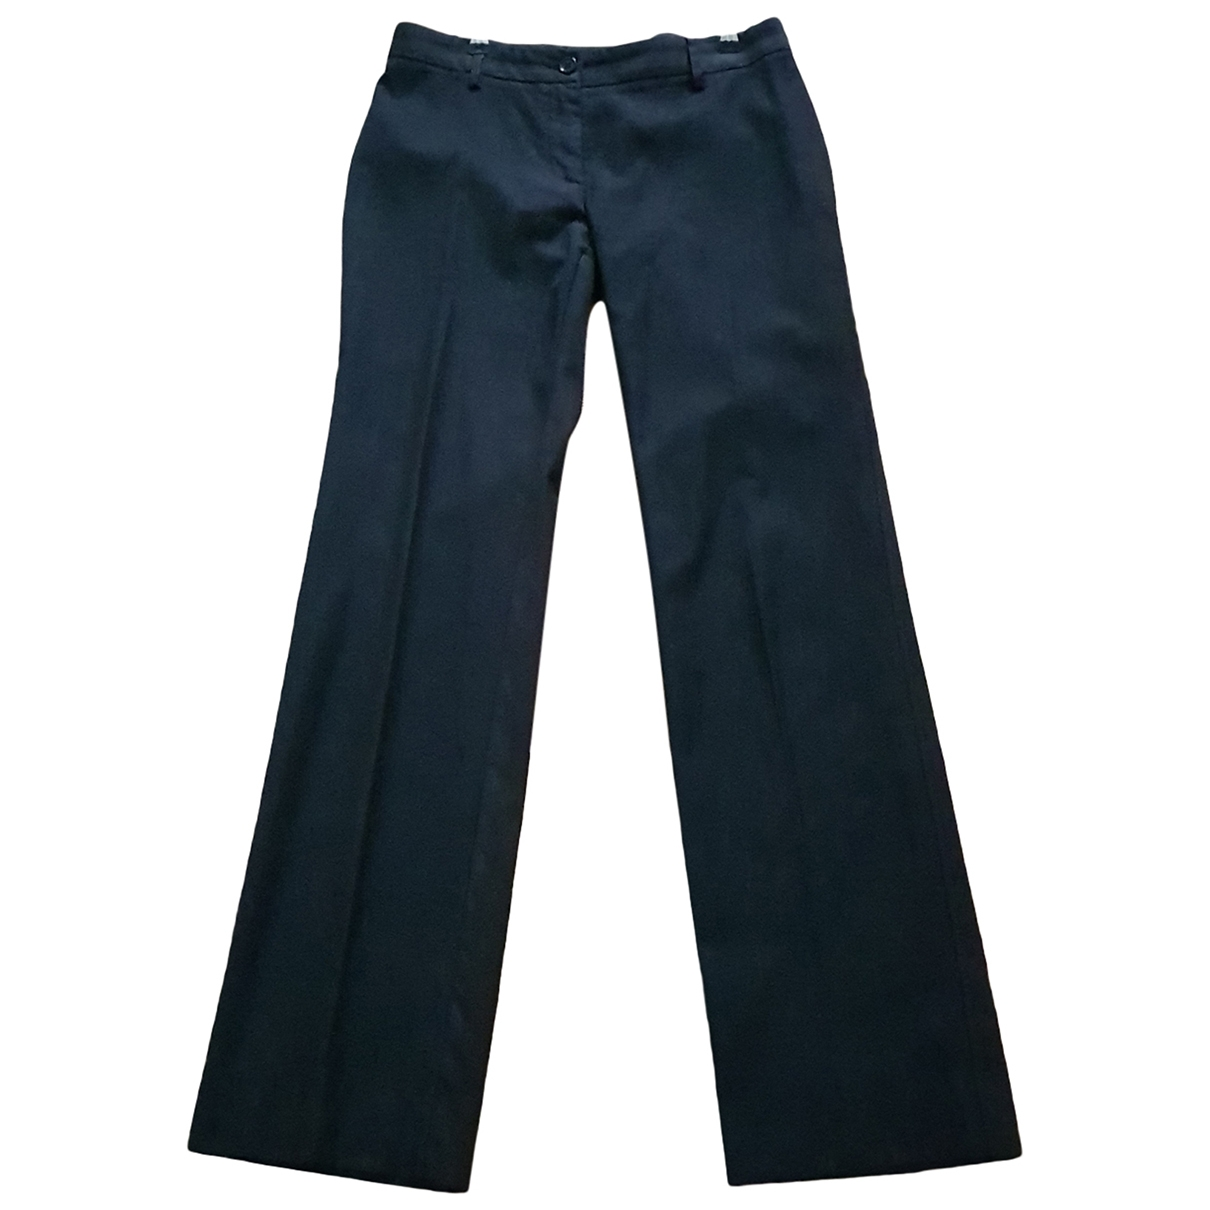 Dolce & Gabbana \N Grey Wool Trousers for Women S International